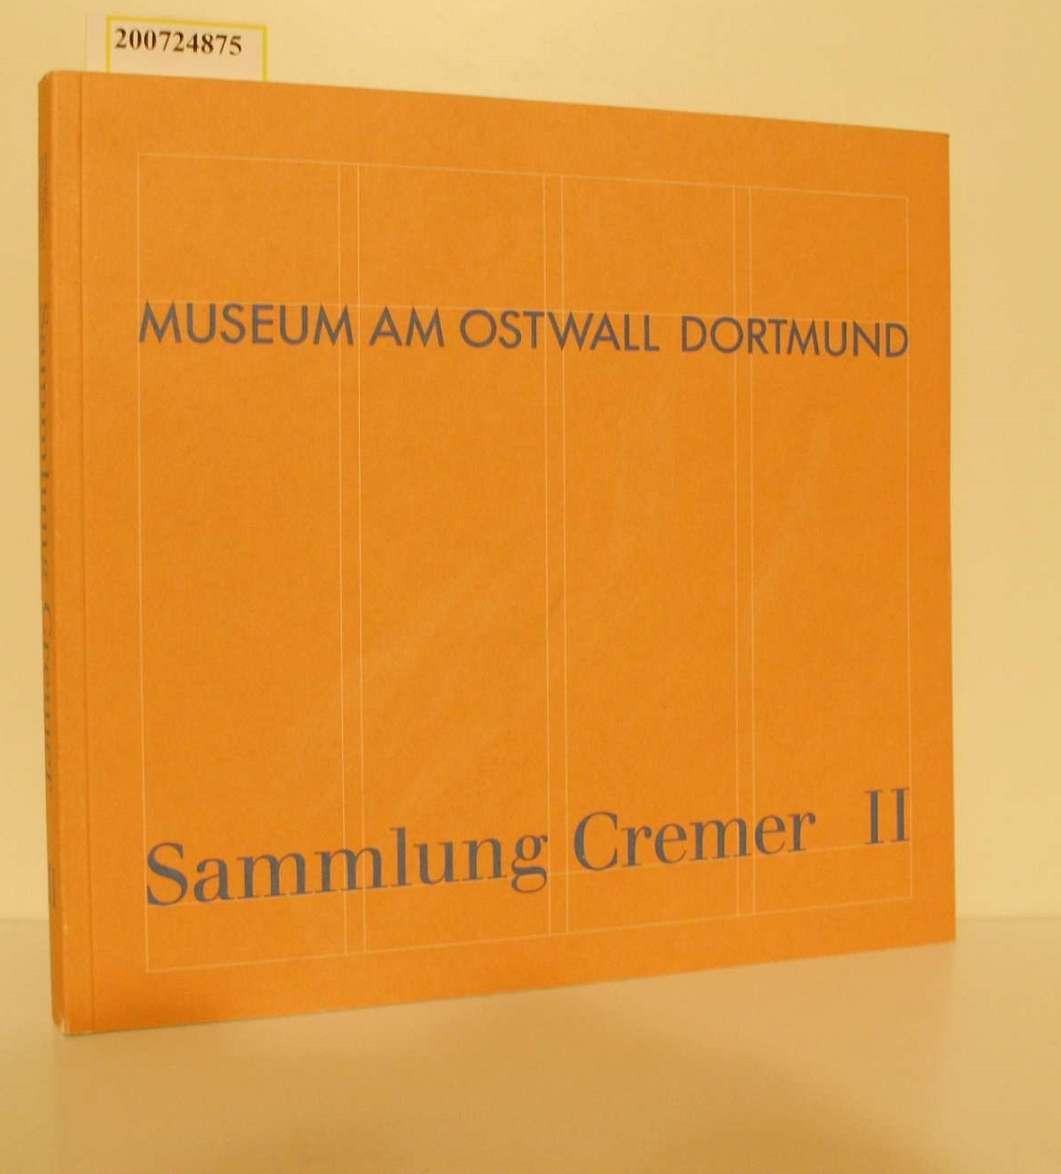 Sammlung Cremer. - Dortmund : Museum am Ostwall Sammlung cremer II